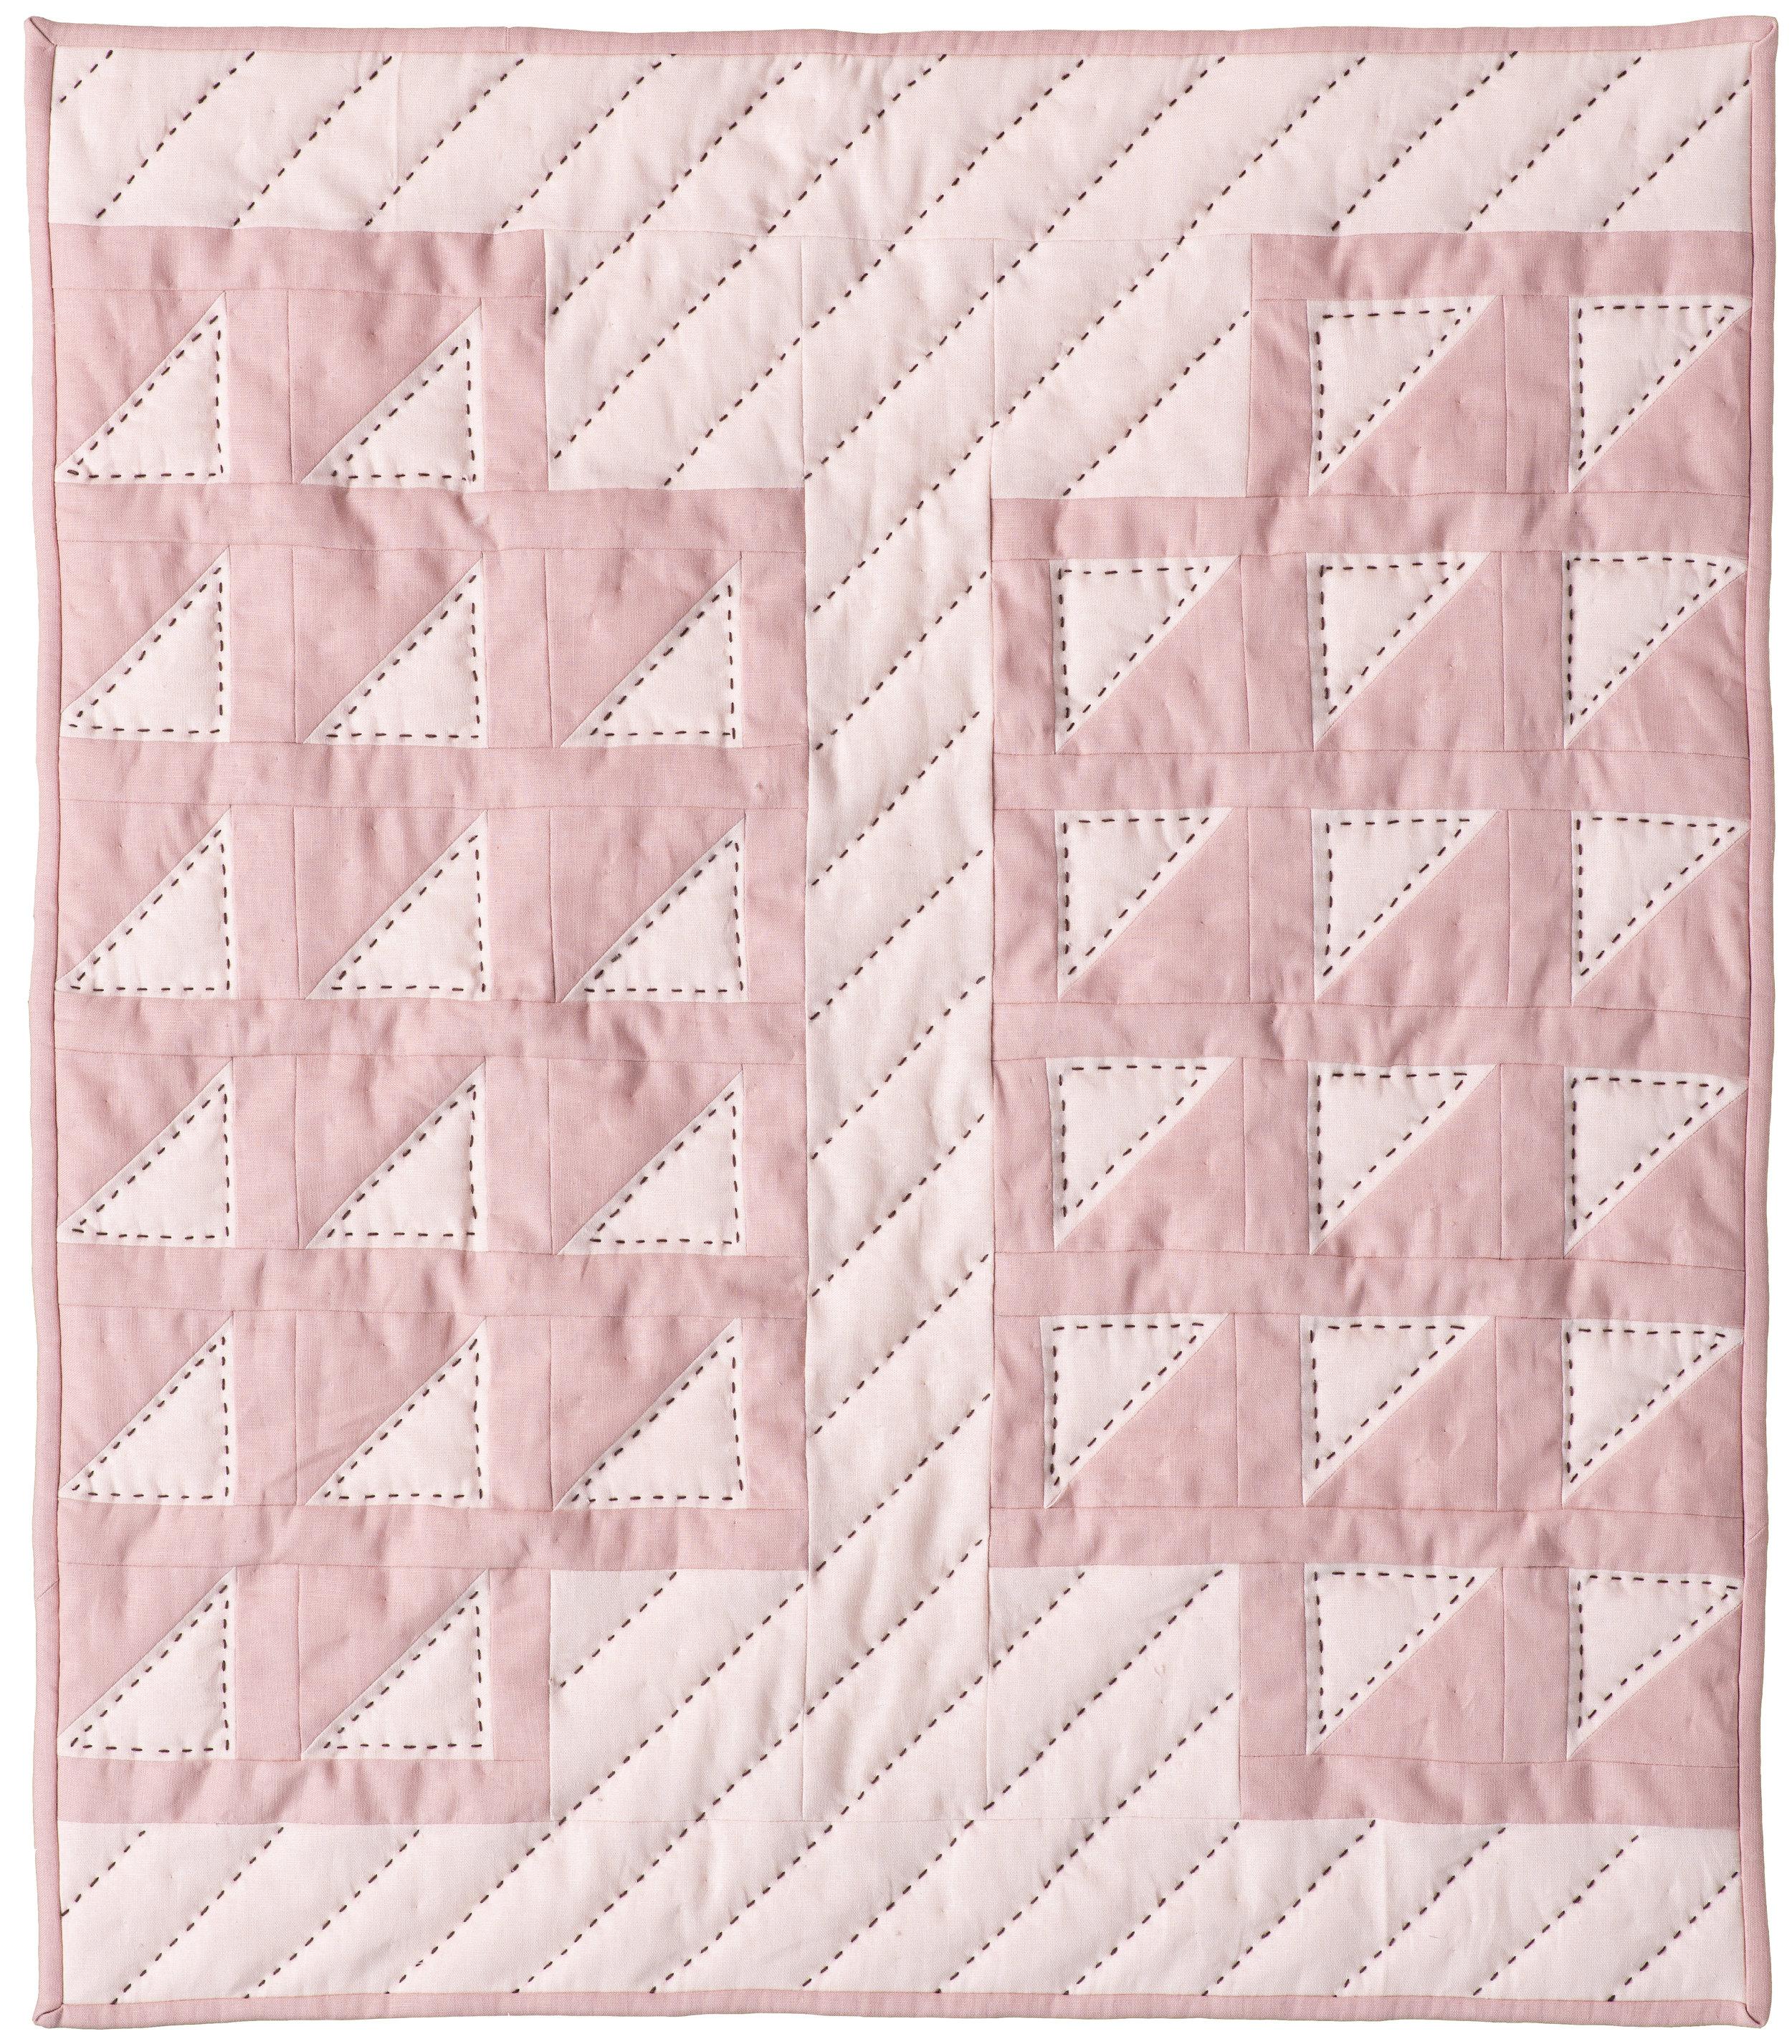 "First Blush – Quilt 1 Crib size, 28"" x 32"""